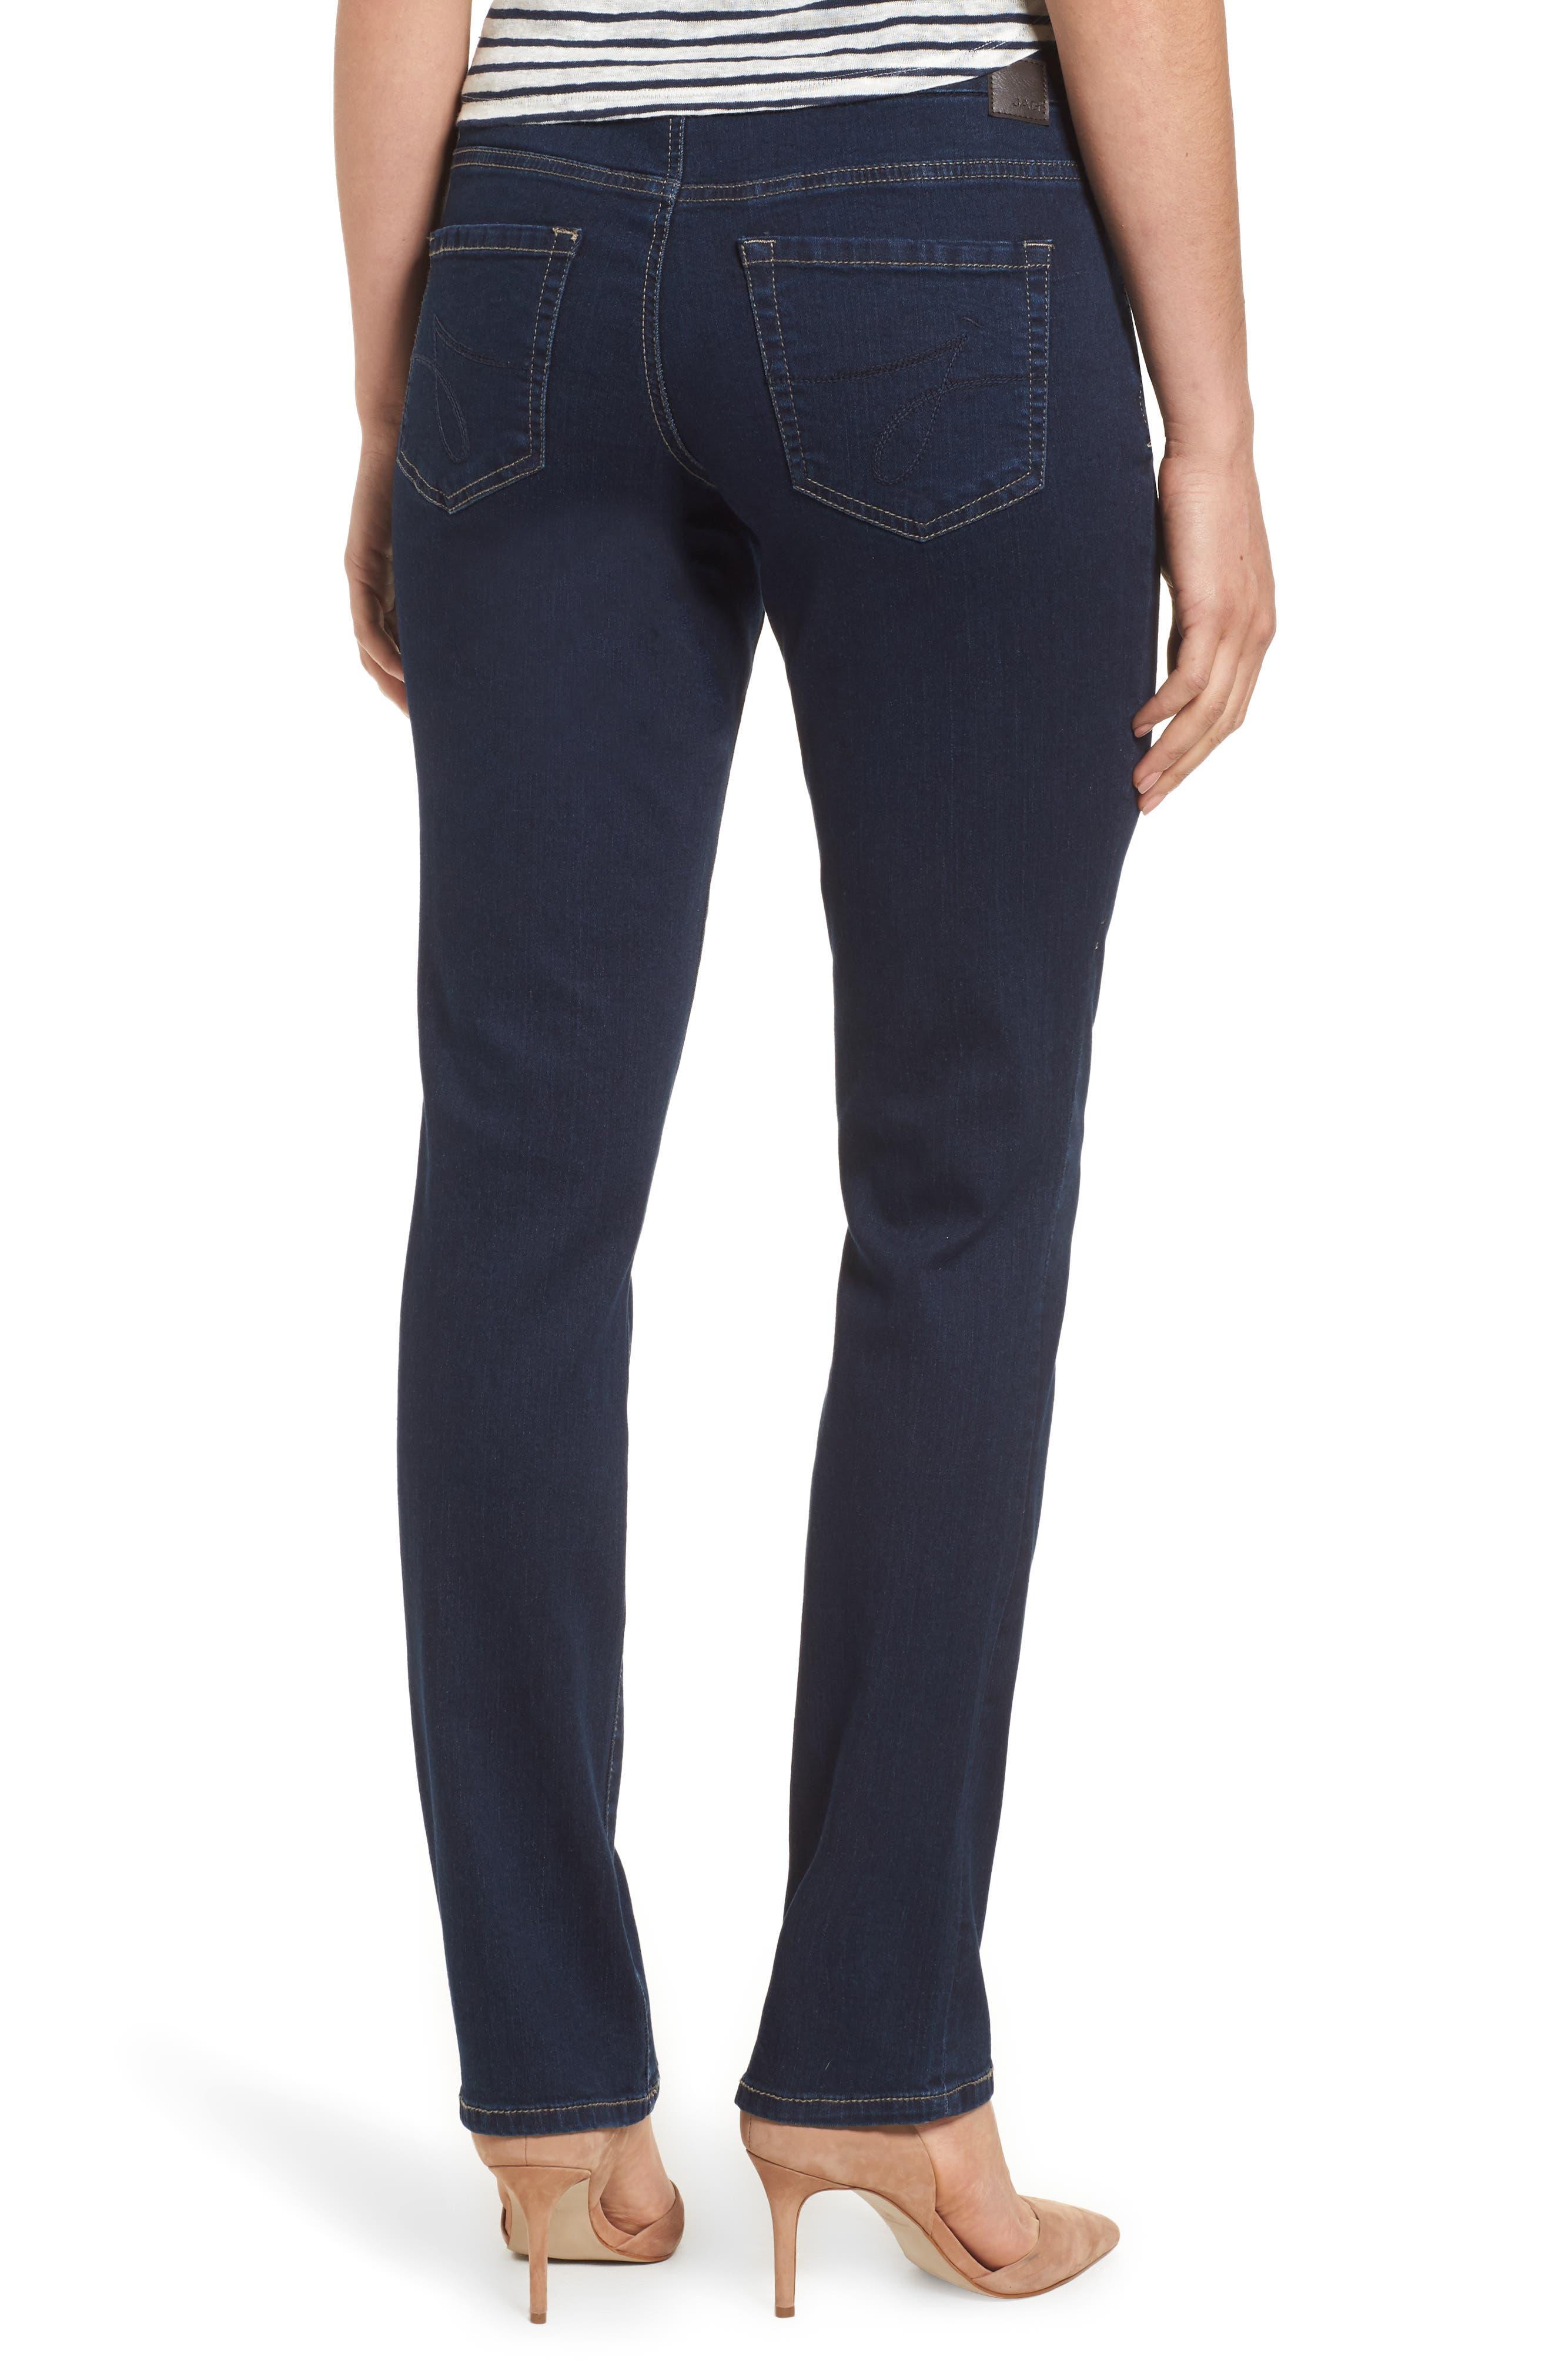 Peri Pull-On Straight Leg Jeans,                             Alternate thumbnail 2, color,                             DARK INDIGO